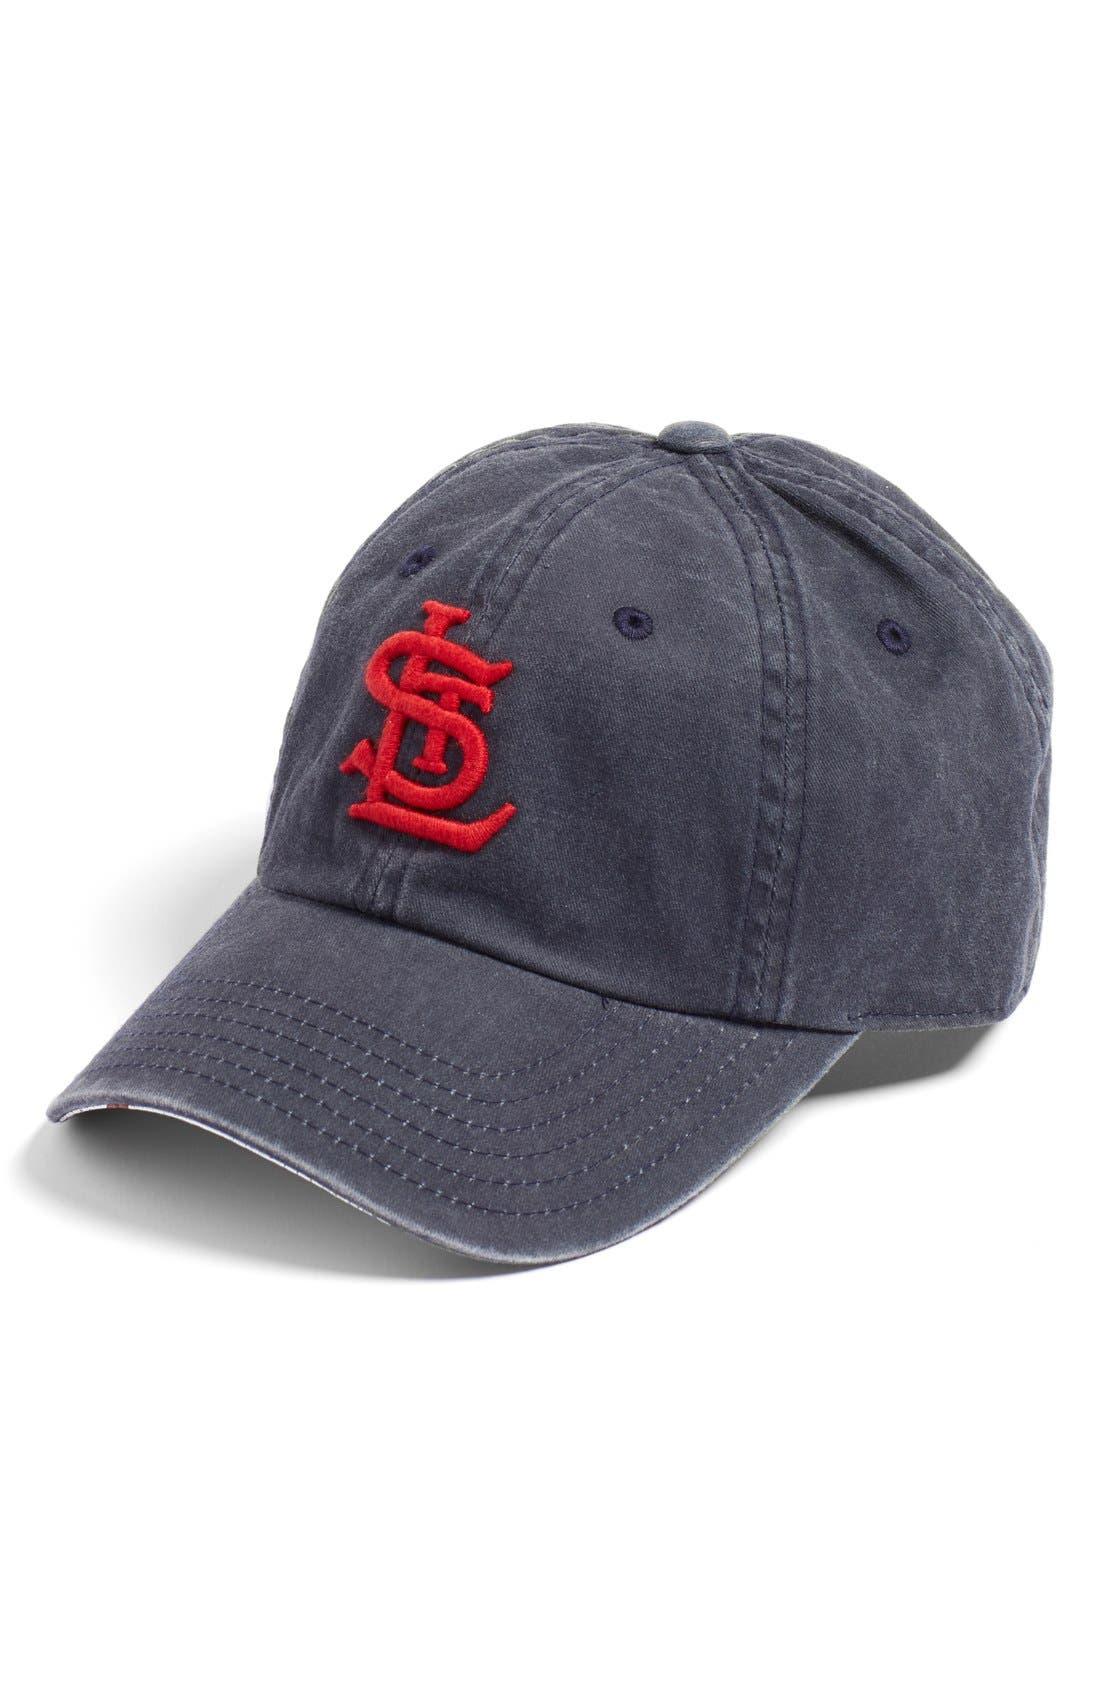 AMERICAN NEEDLE New Raglan St. Louis Cardinals Baseball Cap